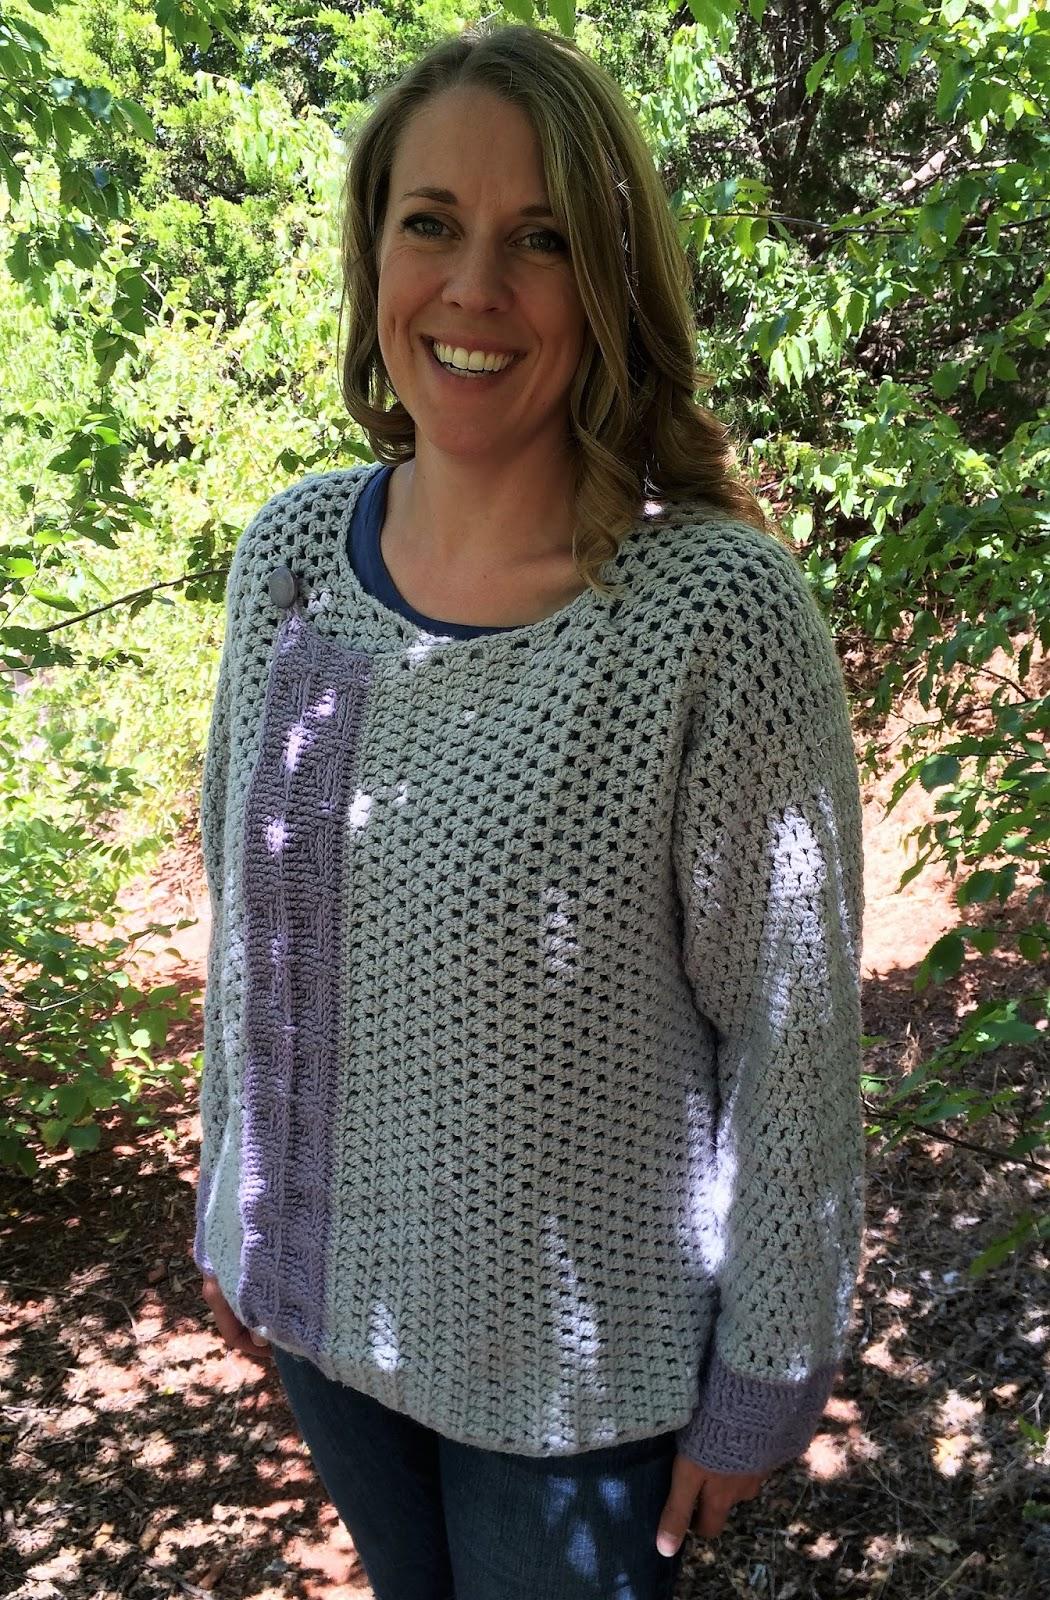 Crochet pattern for a women's cardigan, by April Garwood of Banana Moon Studio